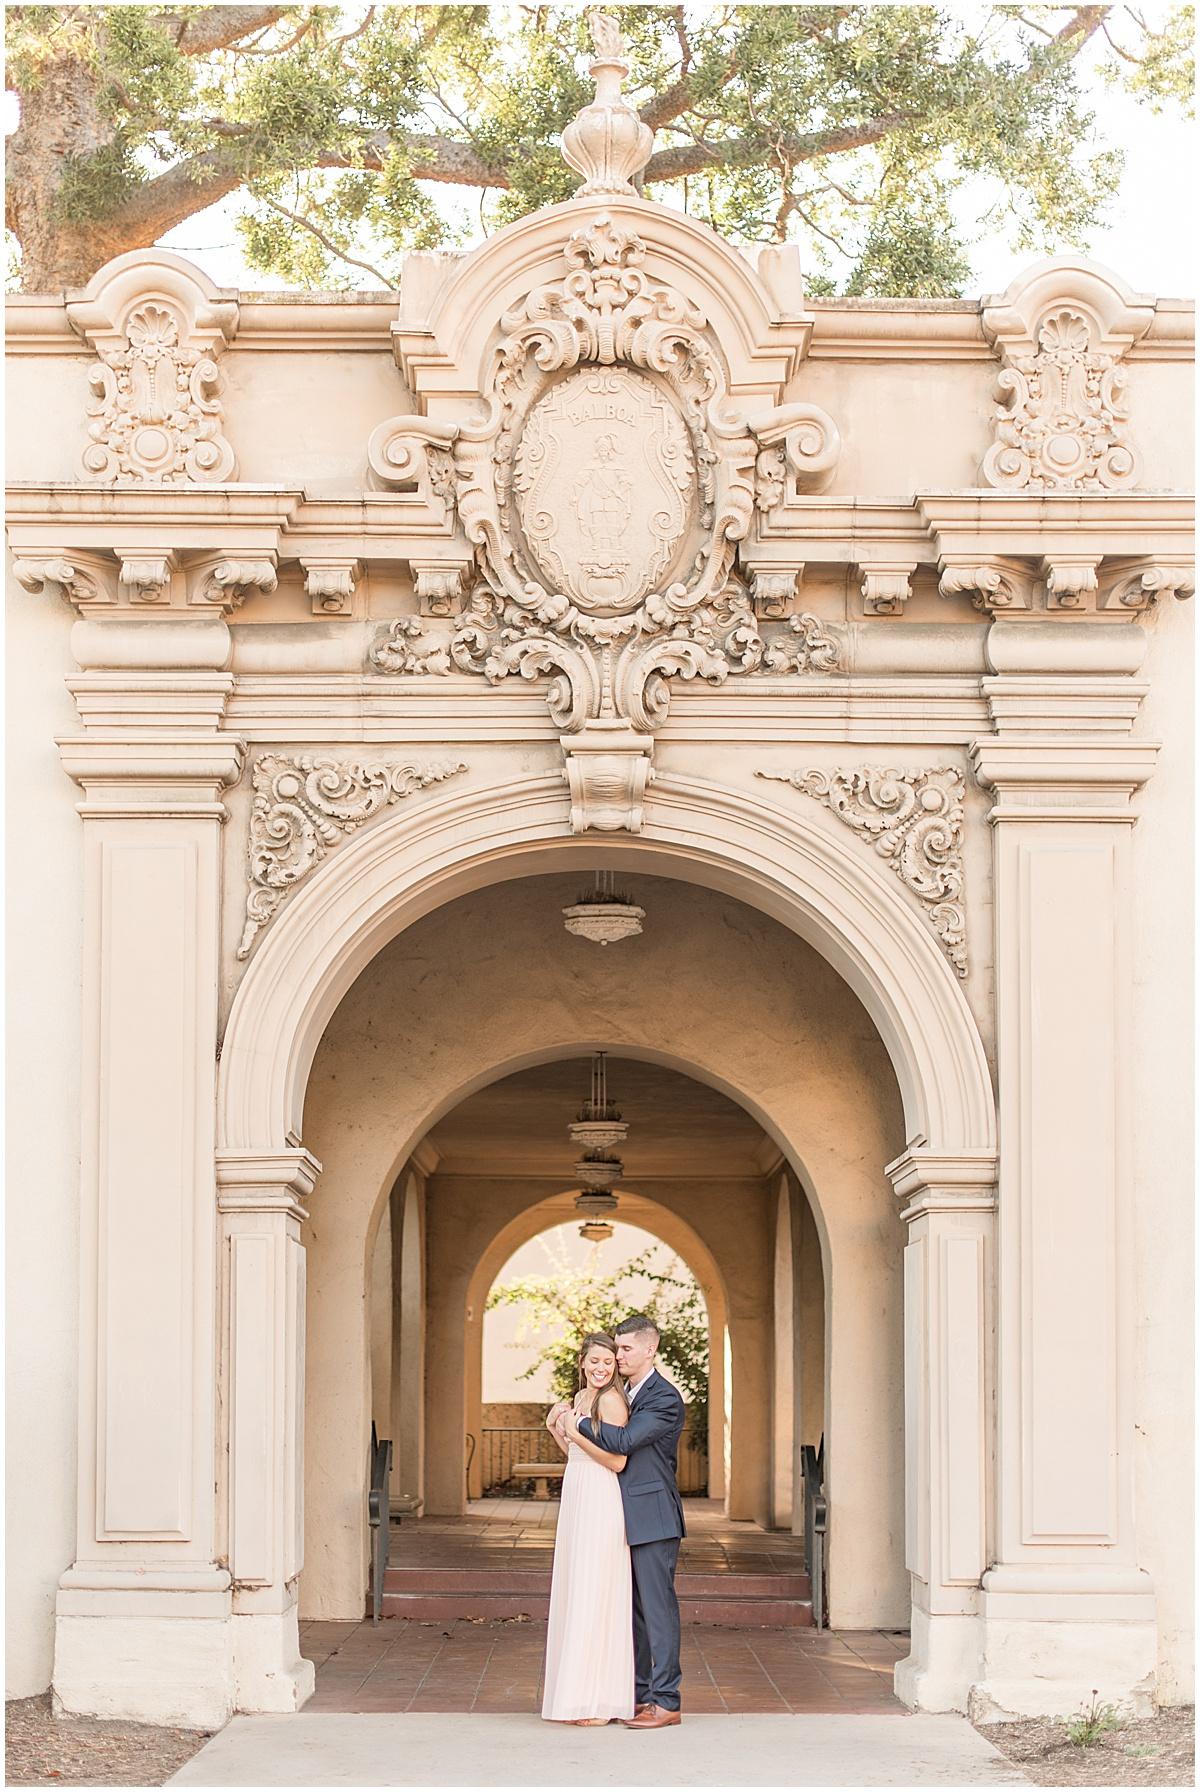 Balboa Park engagement photos in San Diego, California